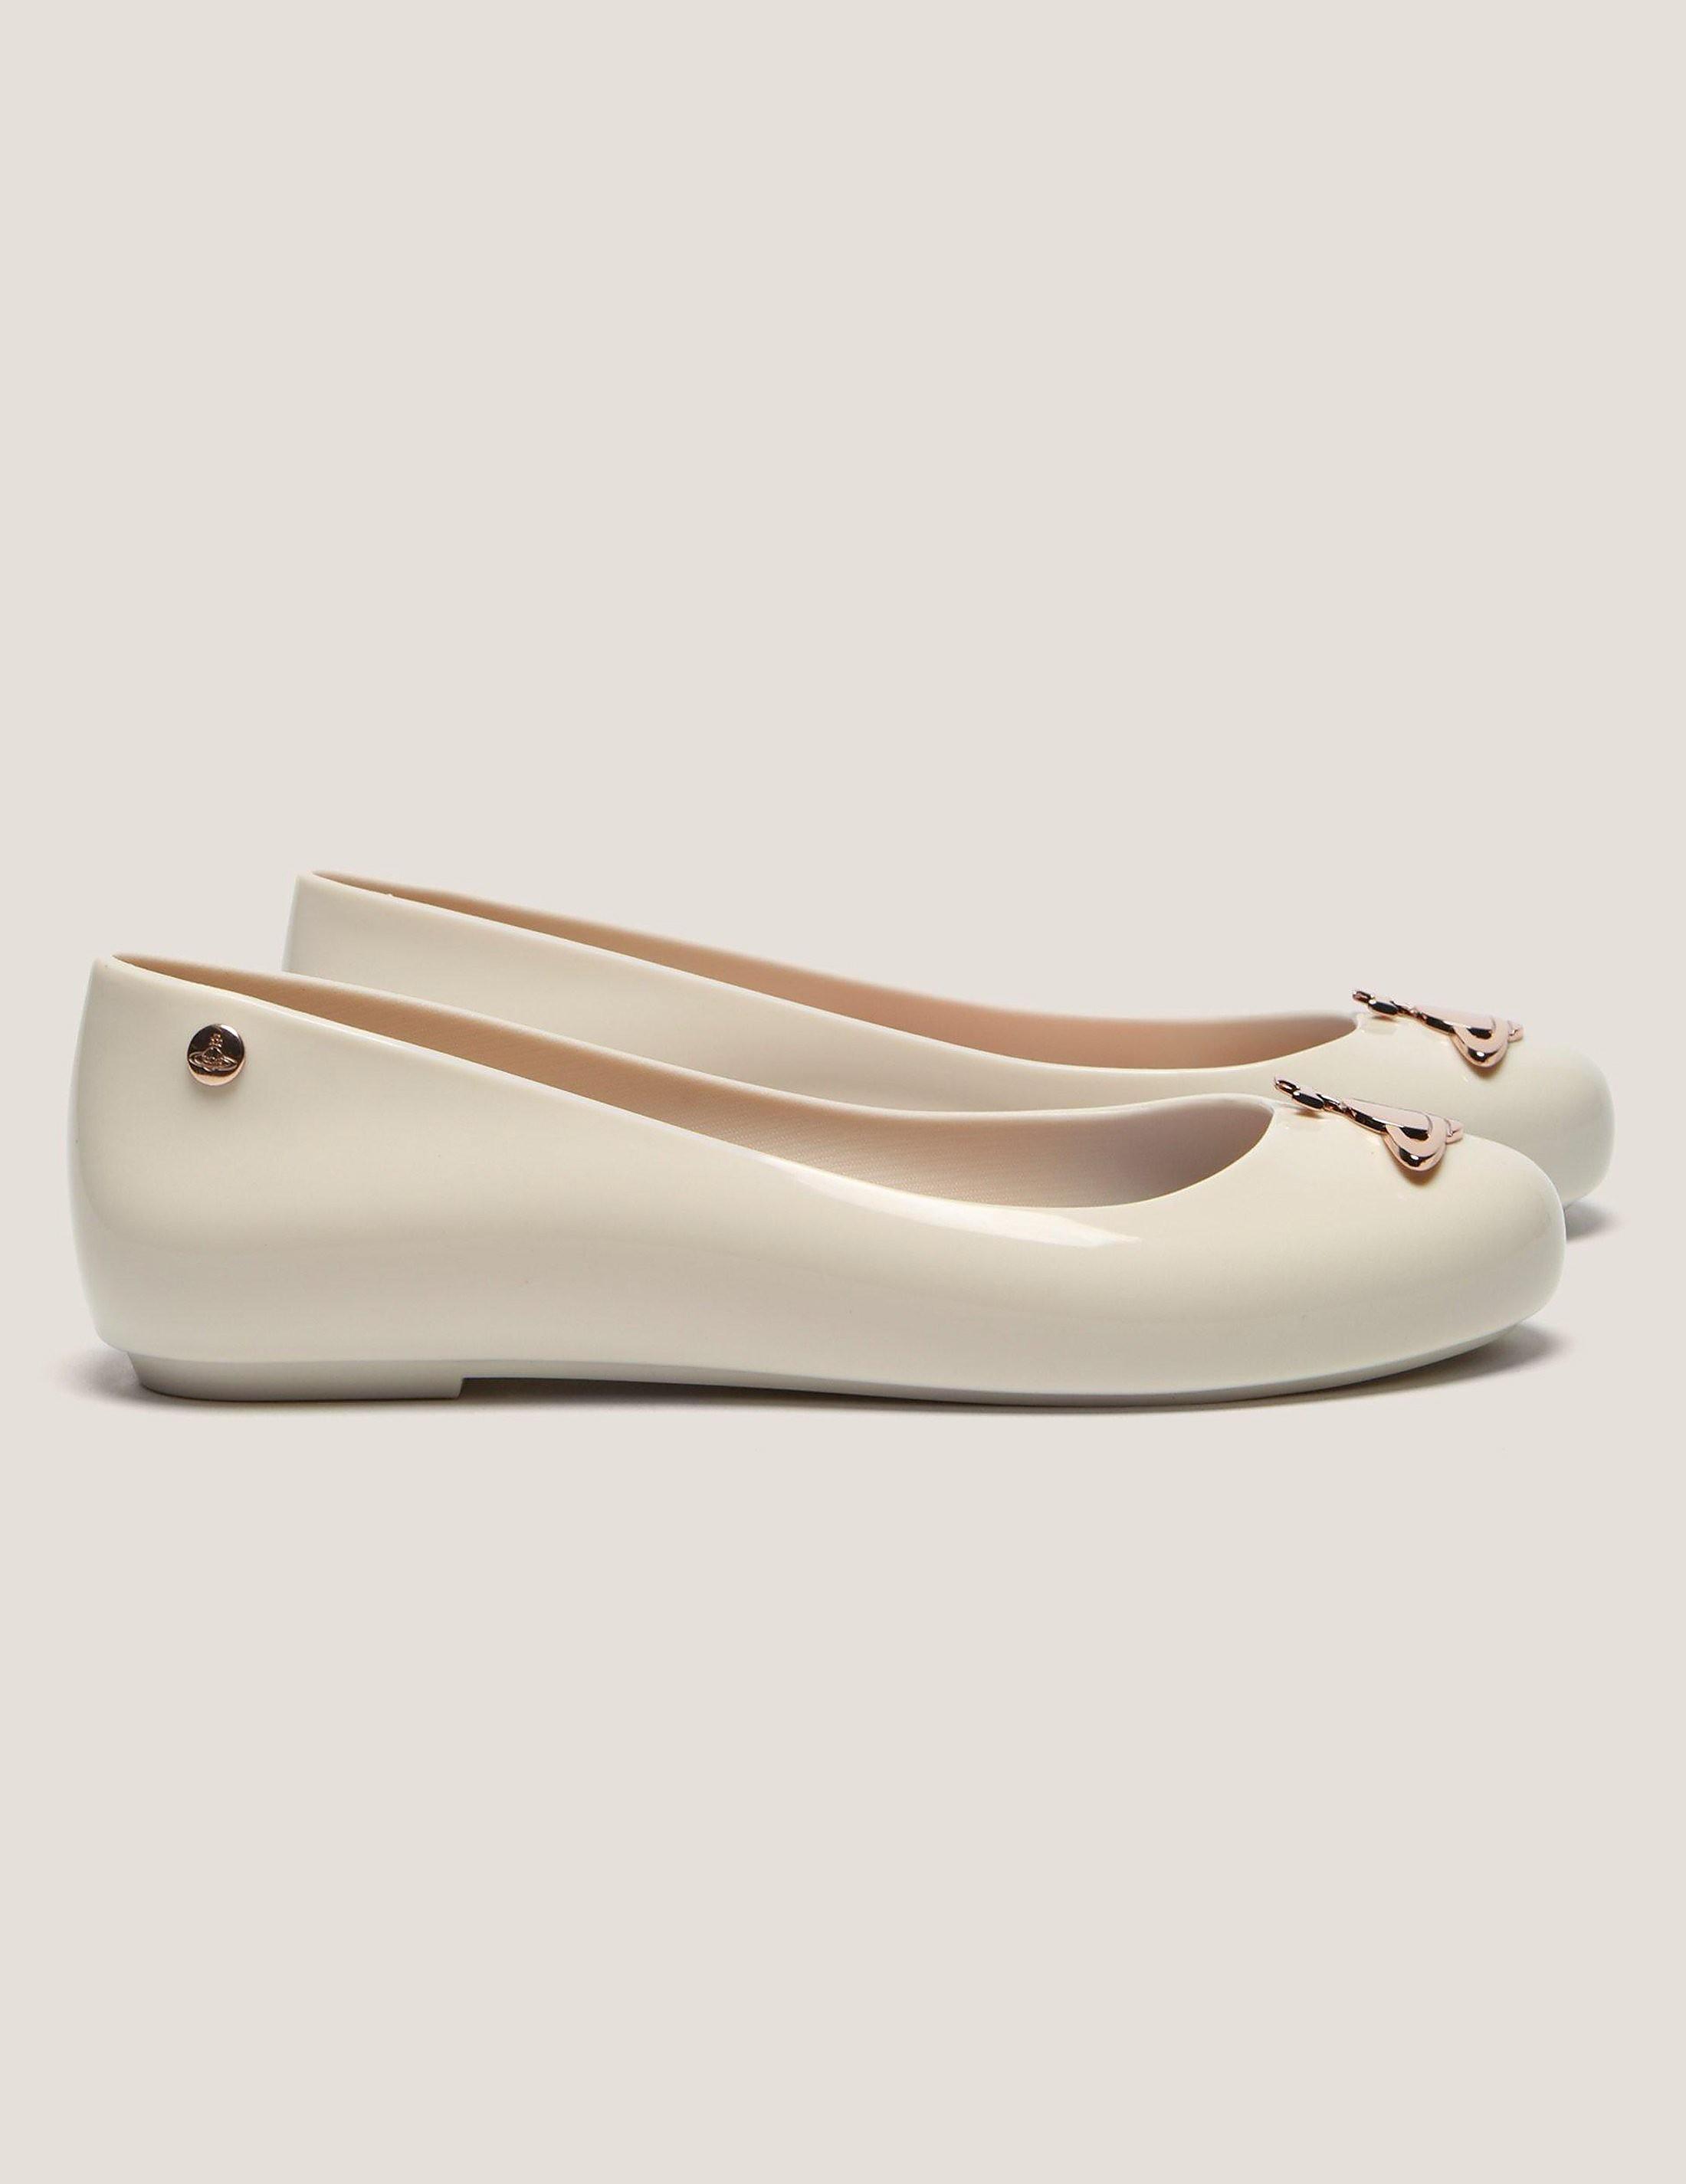 Melissa X Vivienne Westwood Orb Shoe